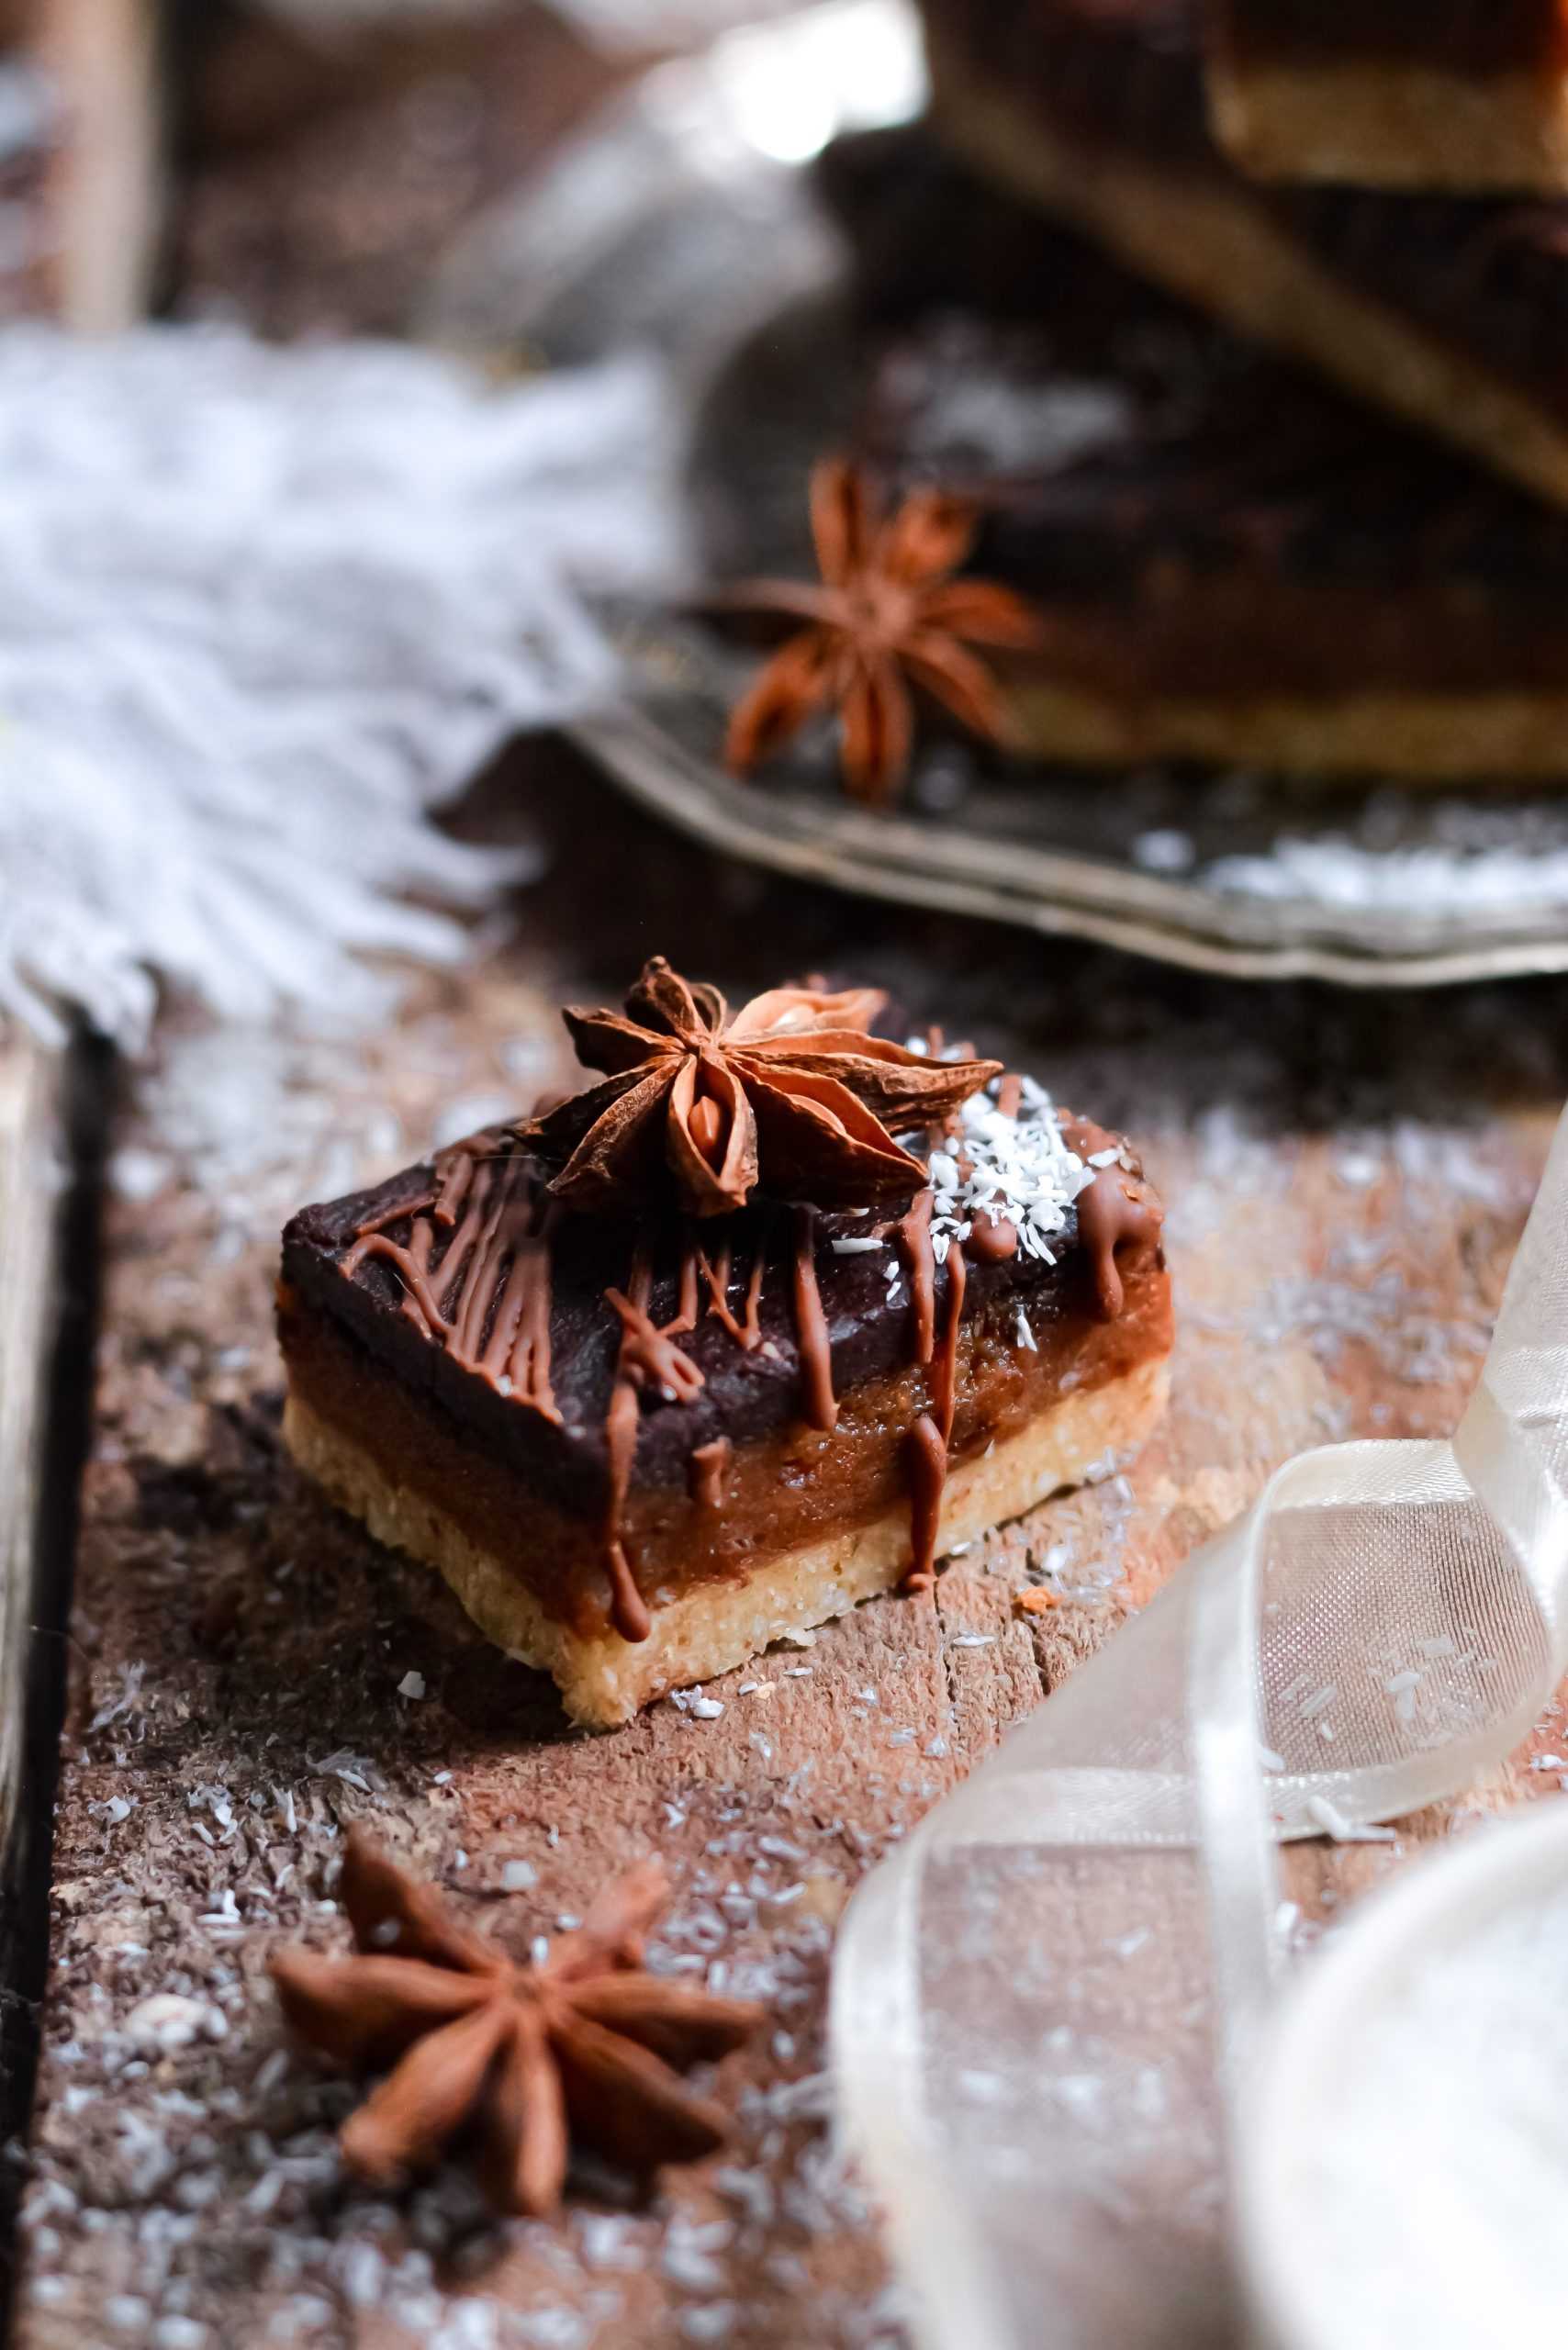 Barres Crues Sans Gluten Vegan au Caramel et Chocolat / Vegan GF Raw Caramel and Chocolate Bars